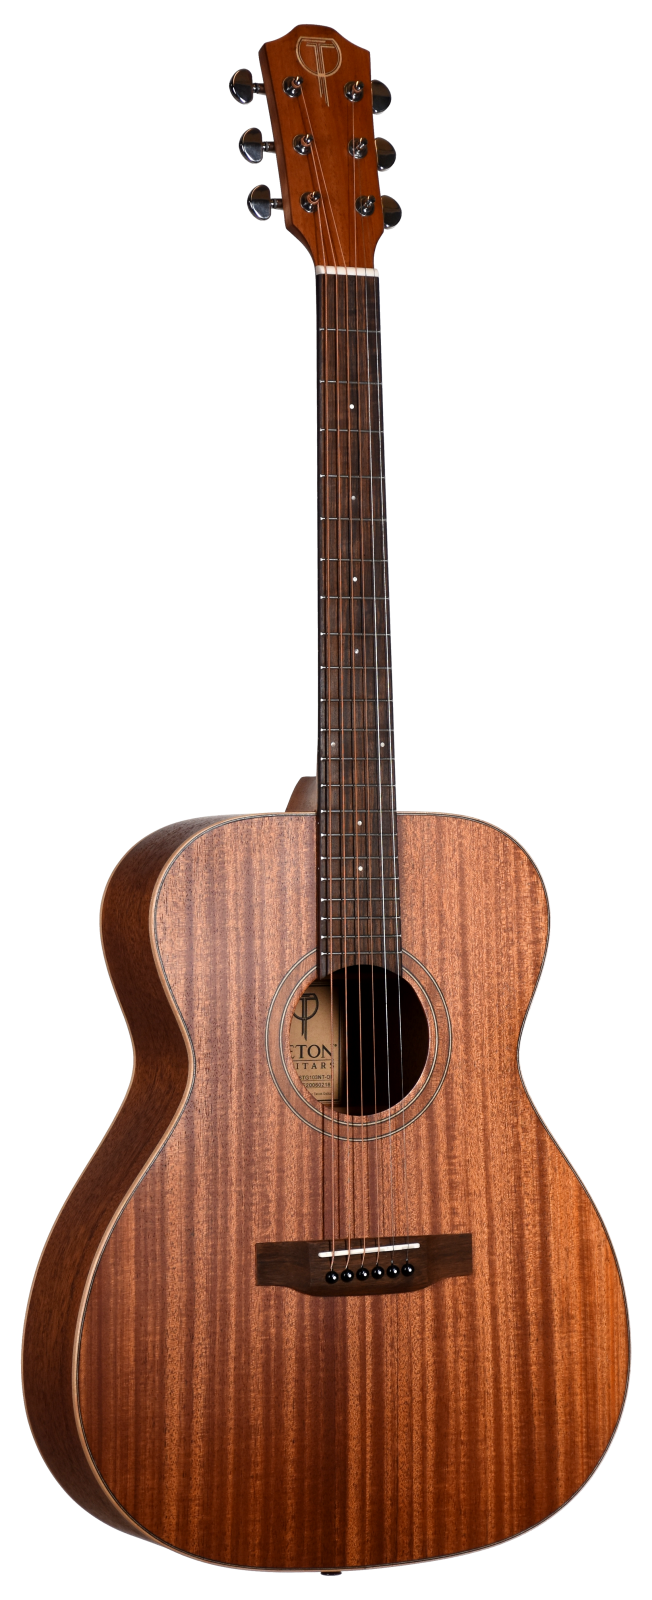 Teton STA103NT-OP Grand Concert Guitar - Solid Mahogany Top, Mahogany Back and Sides